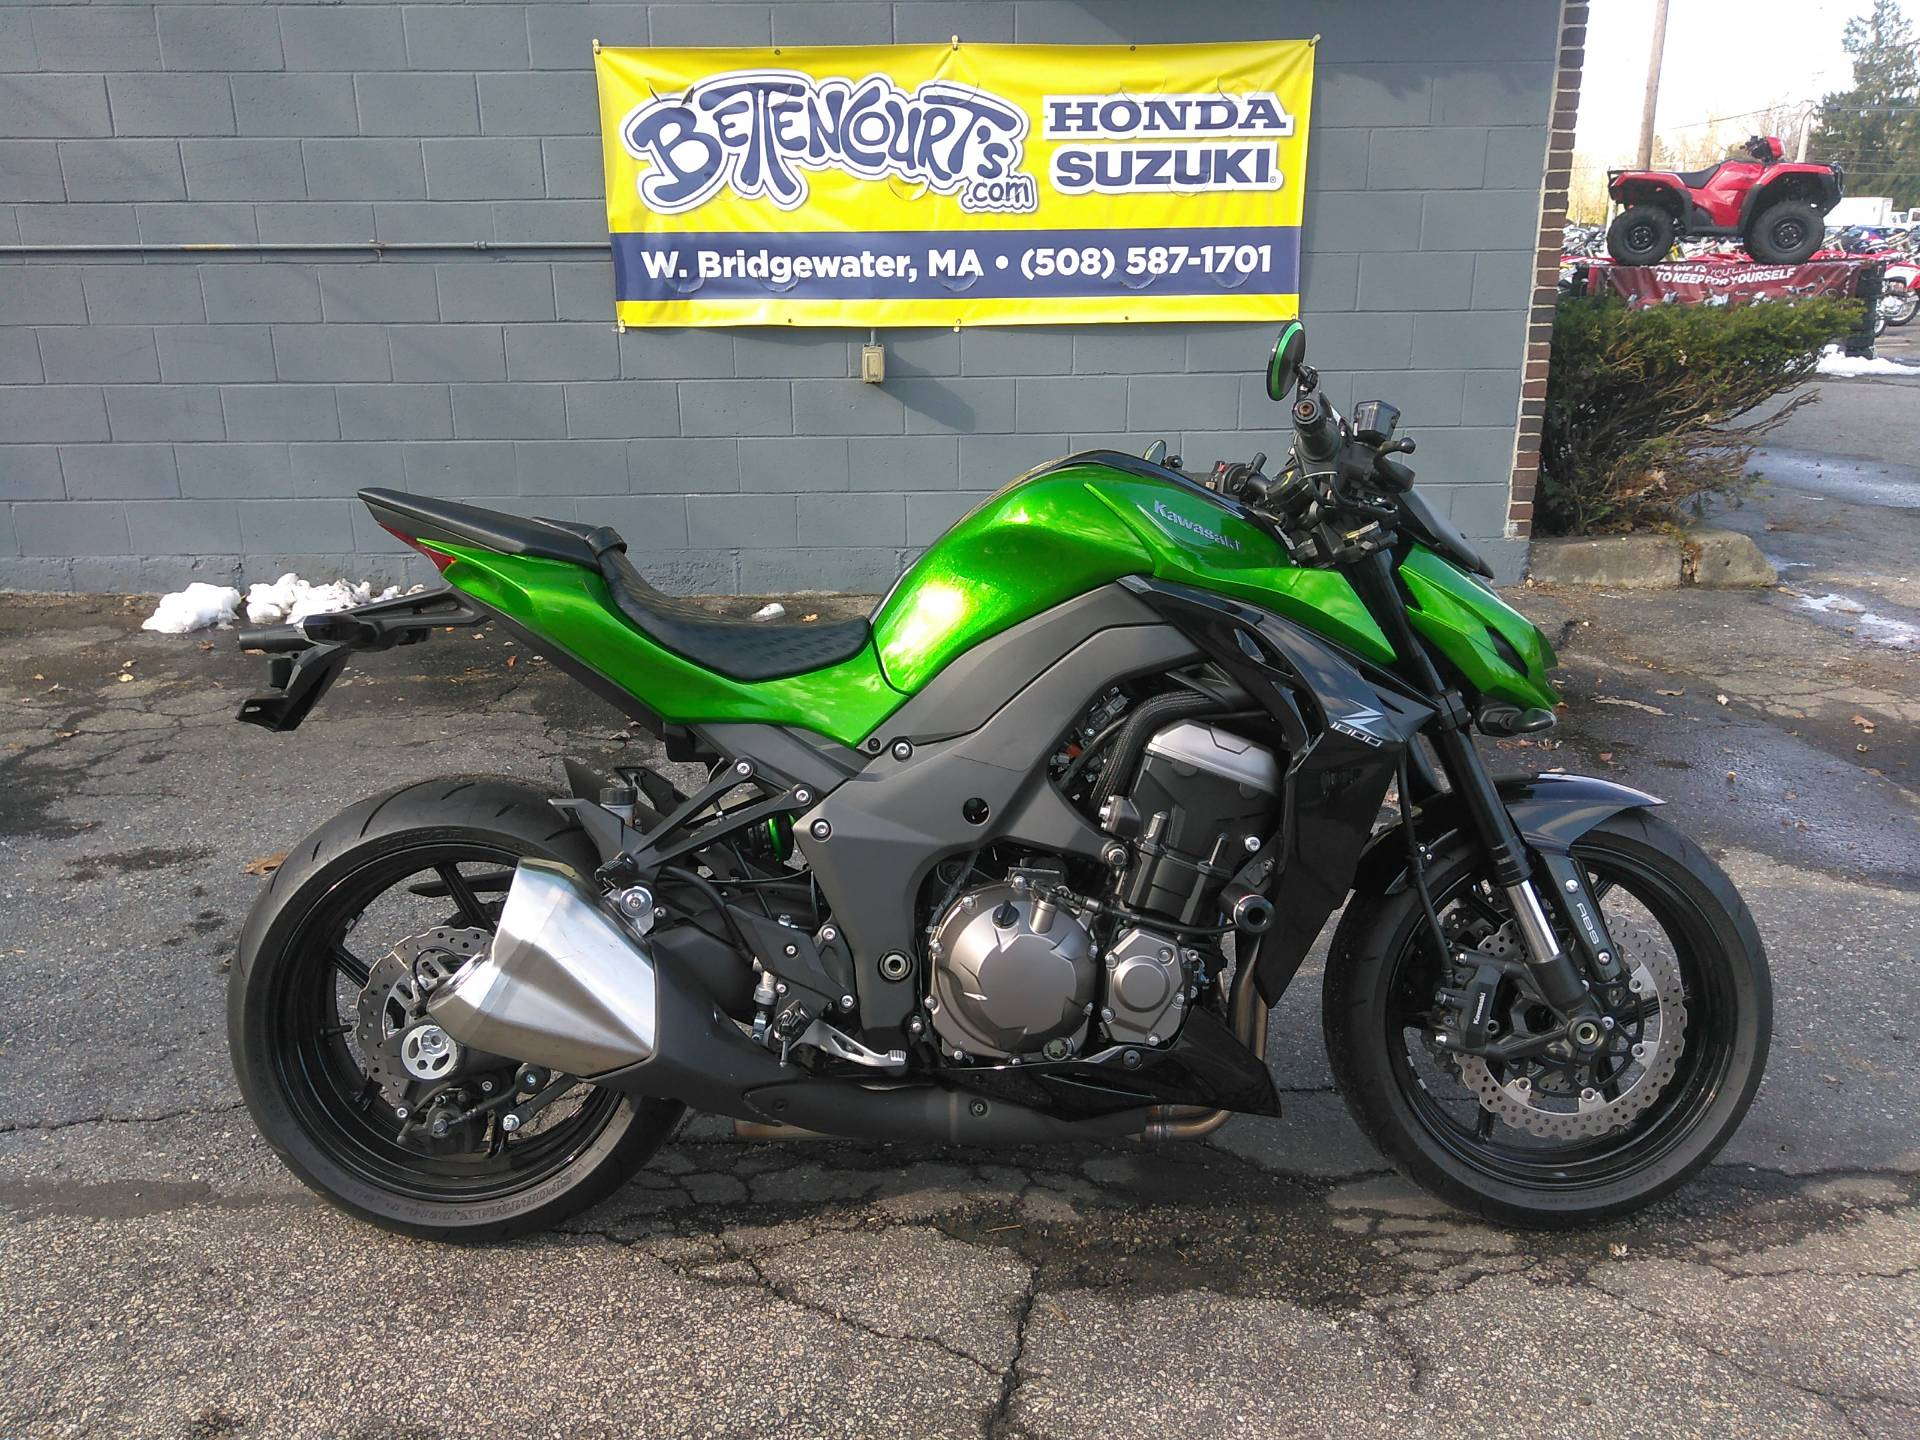 Used 2015 Kawasaki Z1000 Abs Motorcycles In West Bridgewater Ma